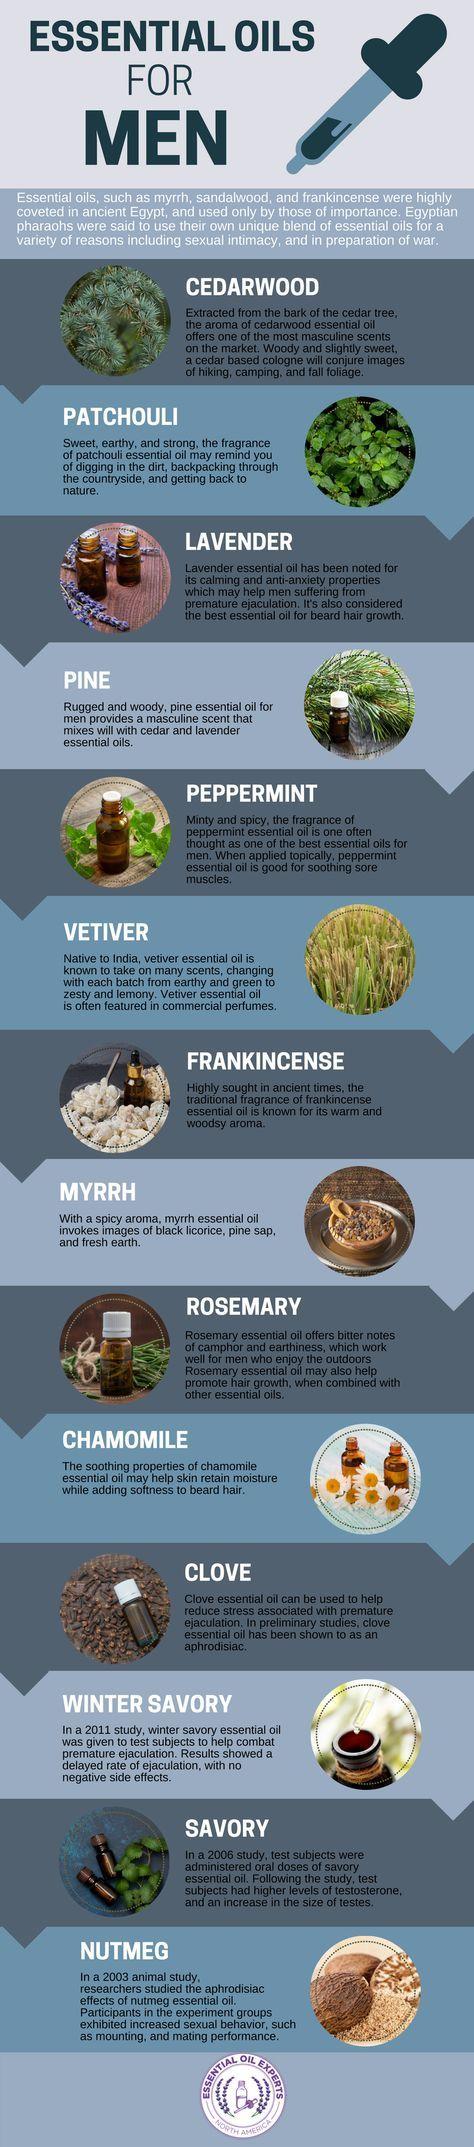 Essential Oils for Men: Cologne, Beards, Premature Ejaculation, Testosterone & Sex